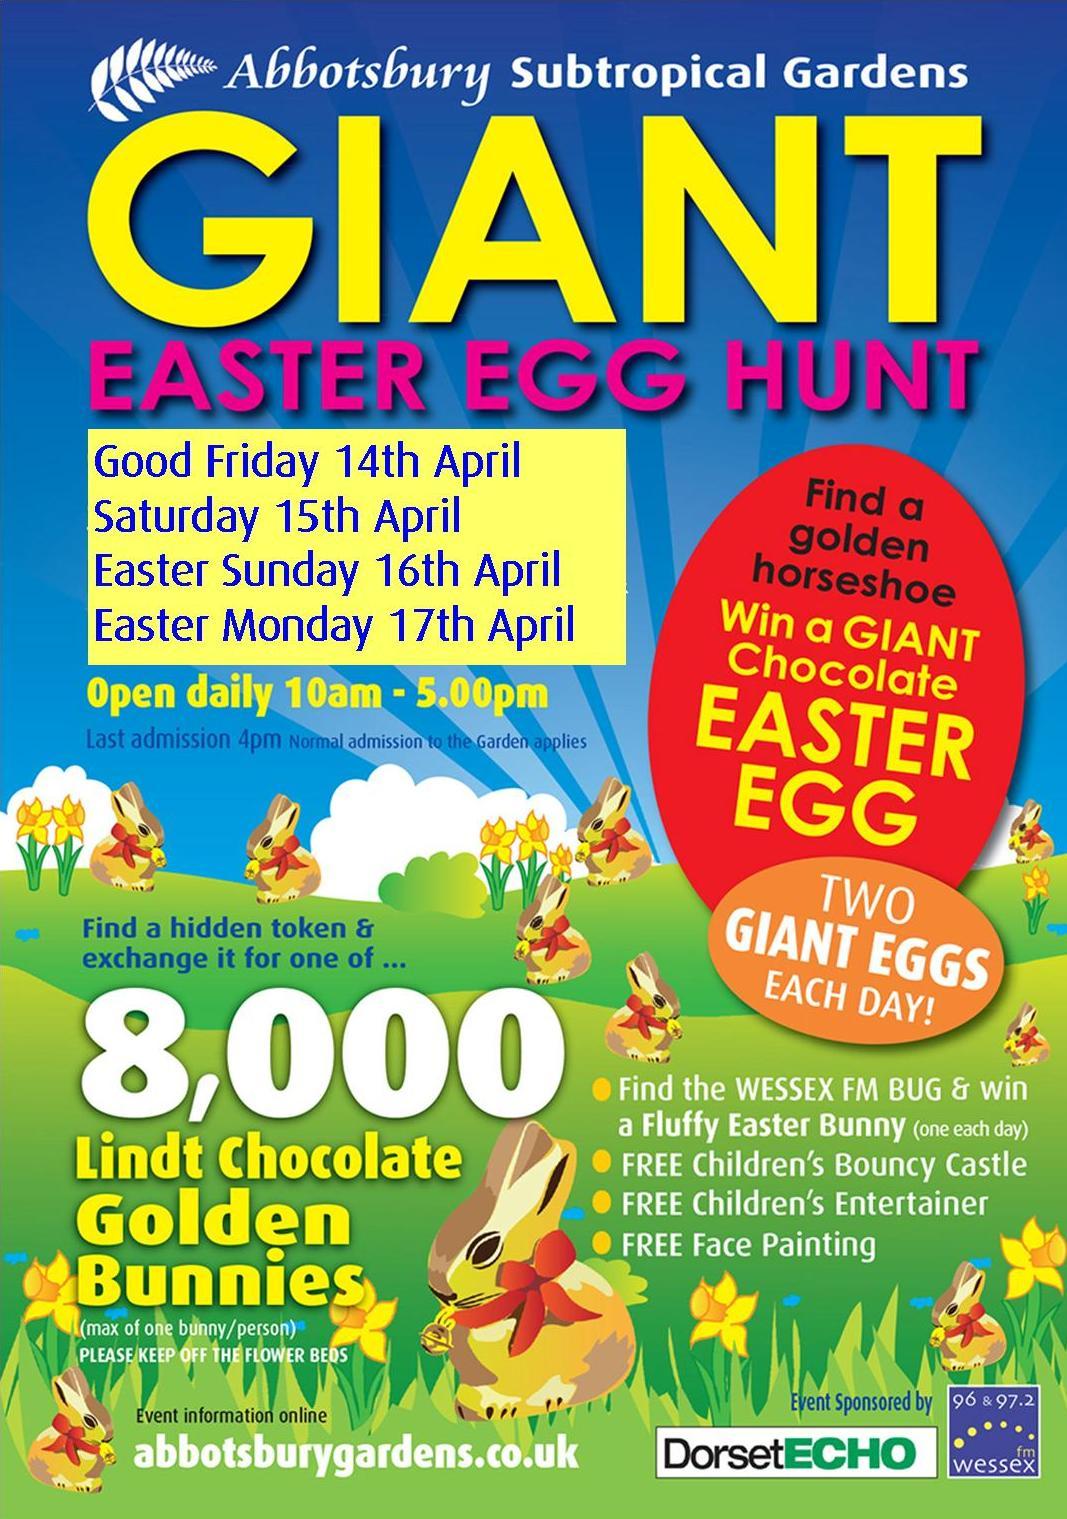 Giant Easter Egg Hunt at Abbotsbury Subtropical Gardens